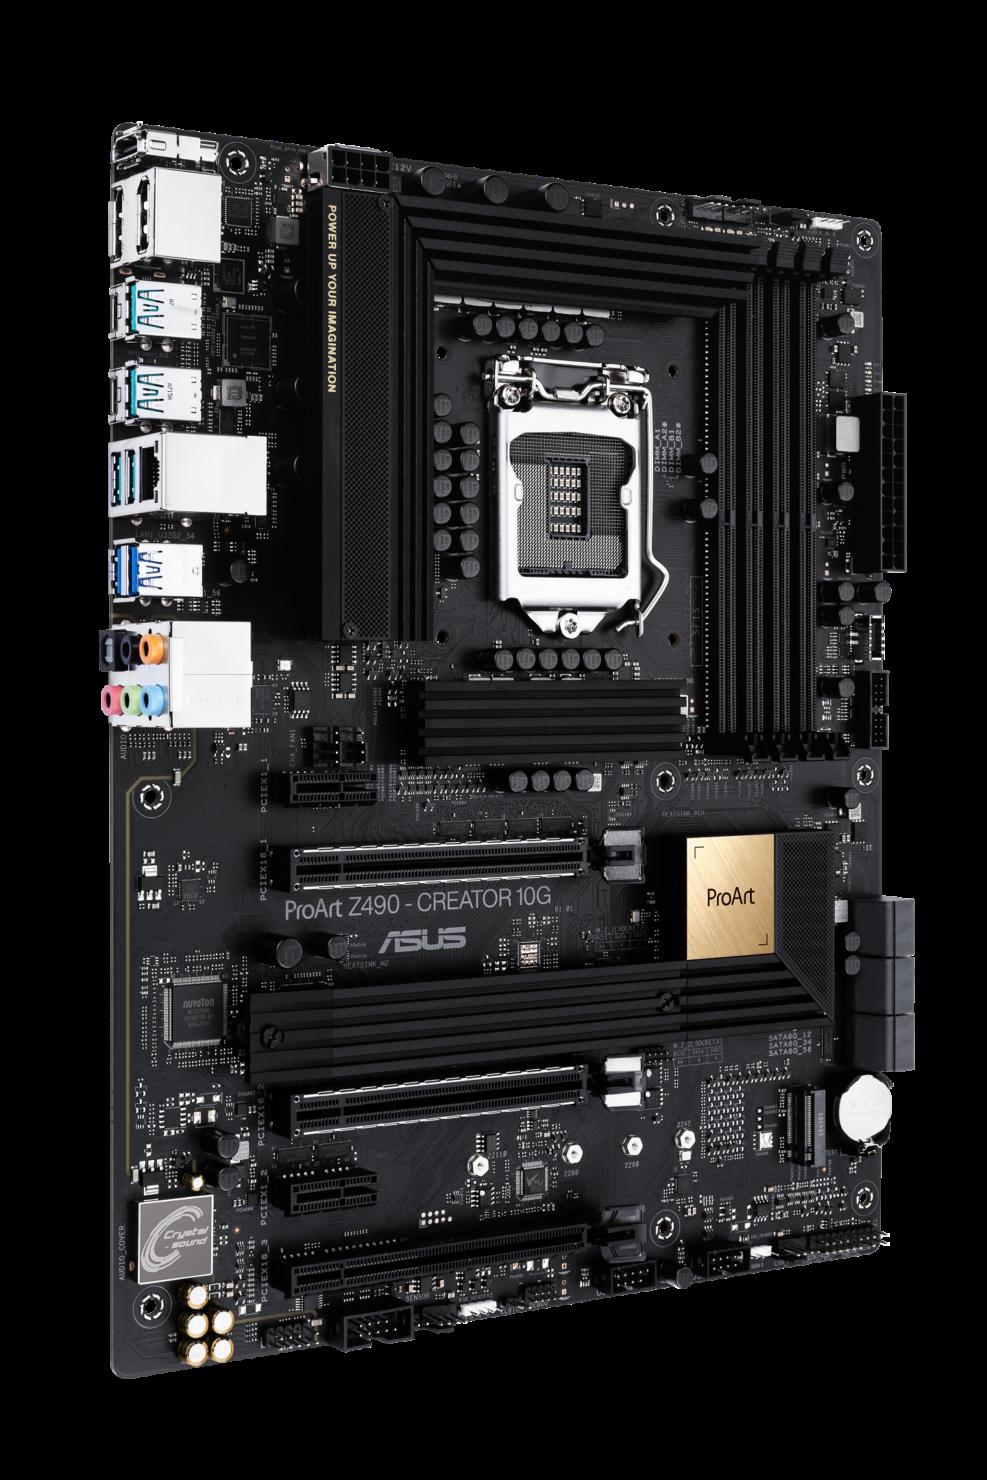 proart-z490-creator-10g_3d-1-custom